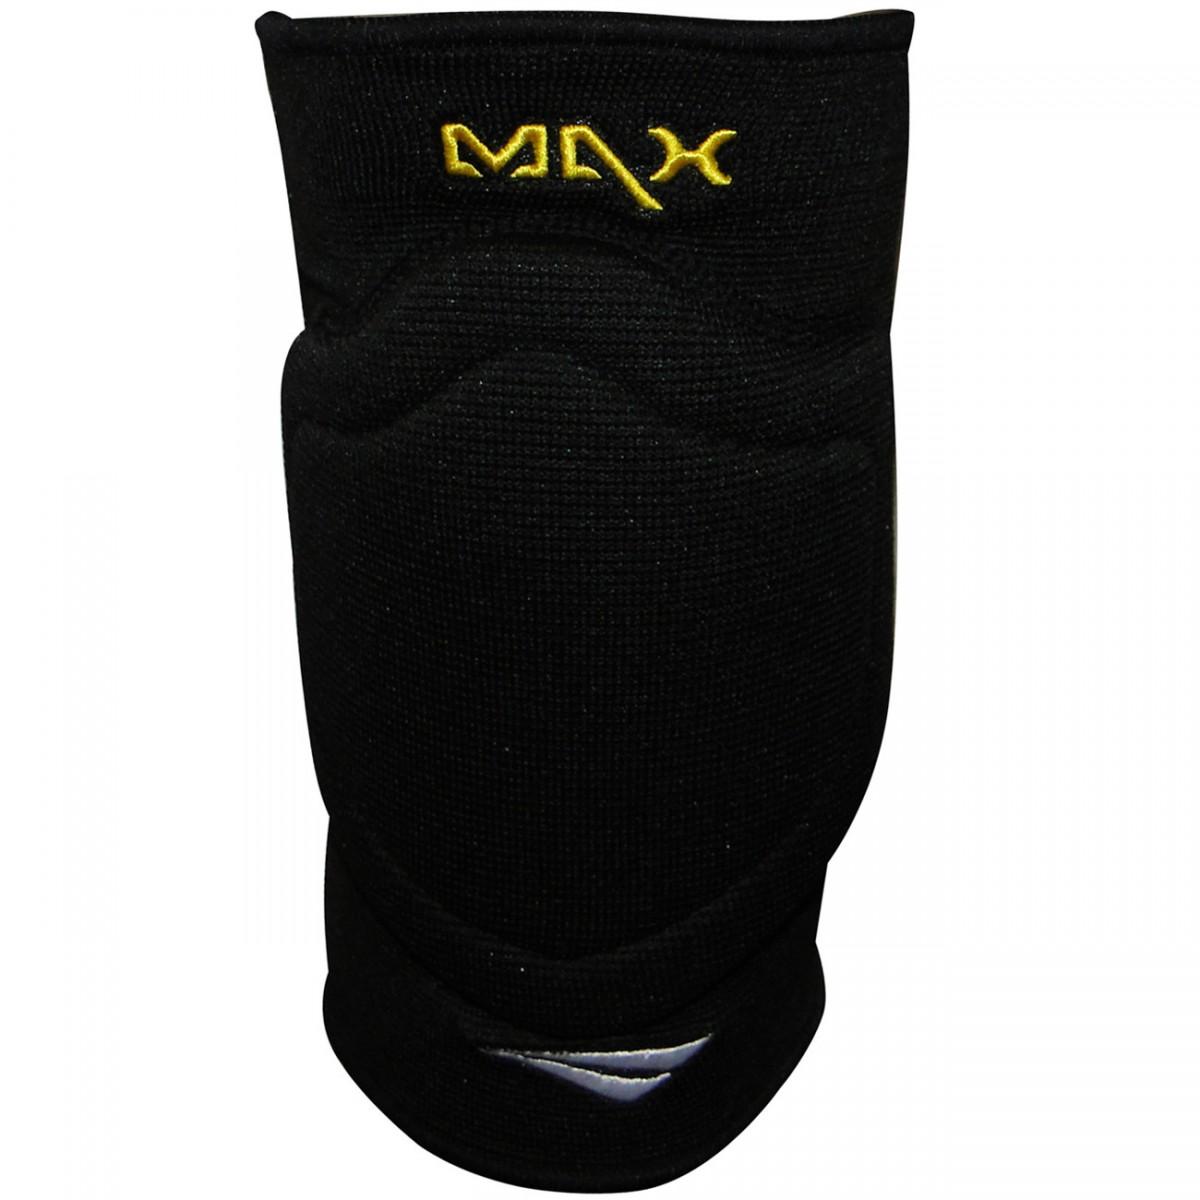 b2d3860fc8eb0 Joelheira Penalty Max 11 3398 - PRETO - Chuteira Nike